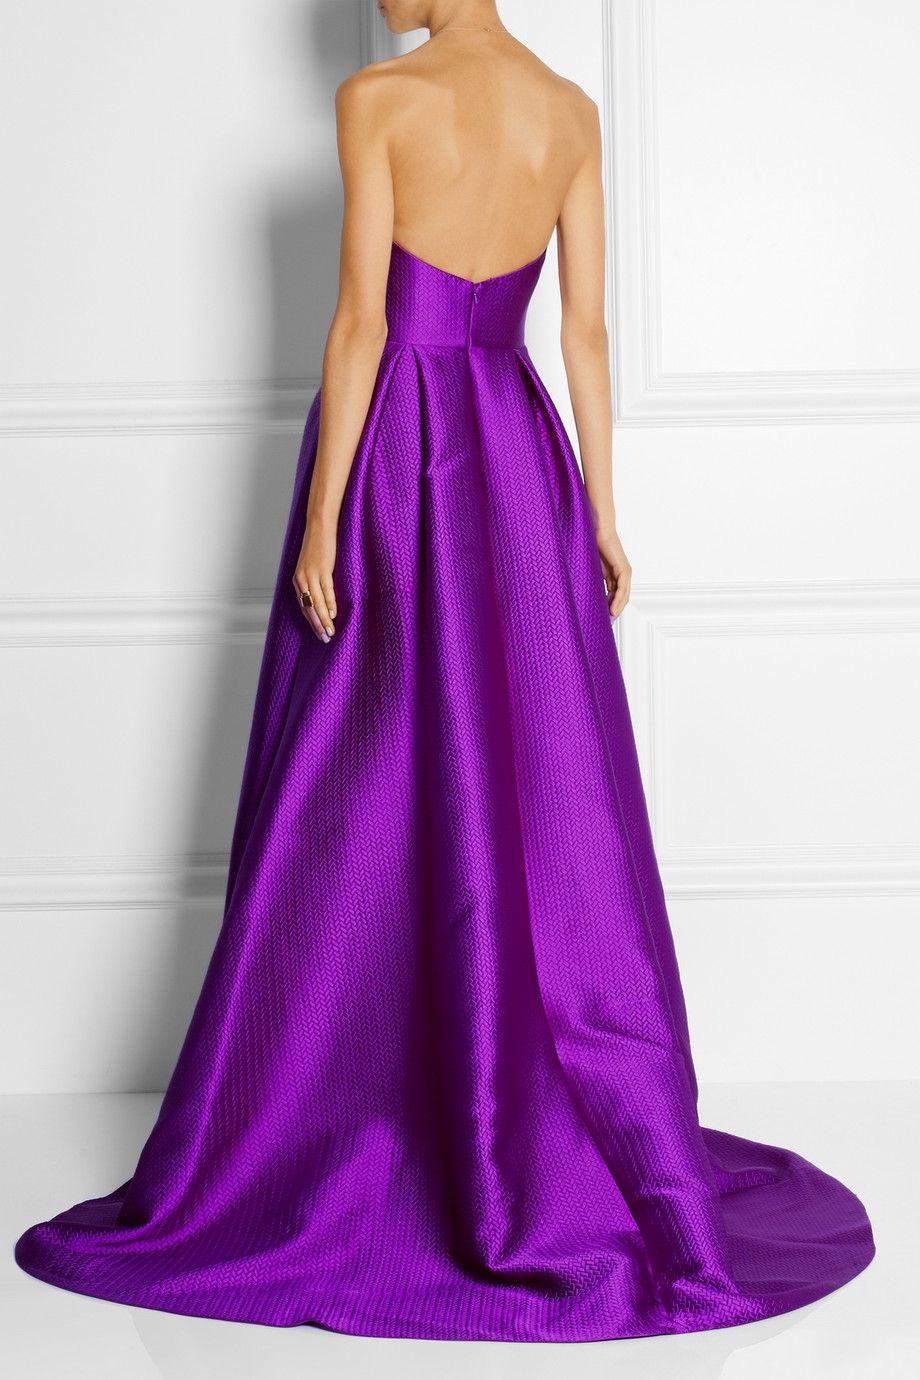 Lela rose embossed satin gown netaportercom purple